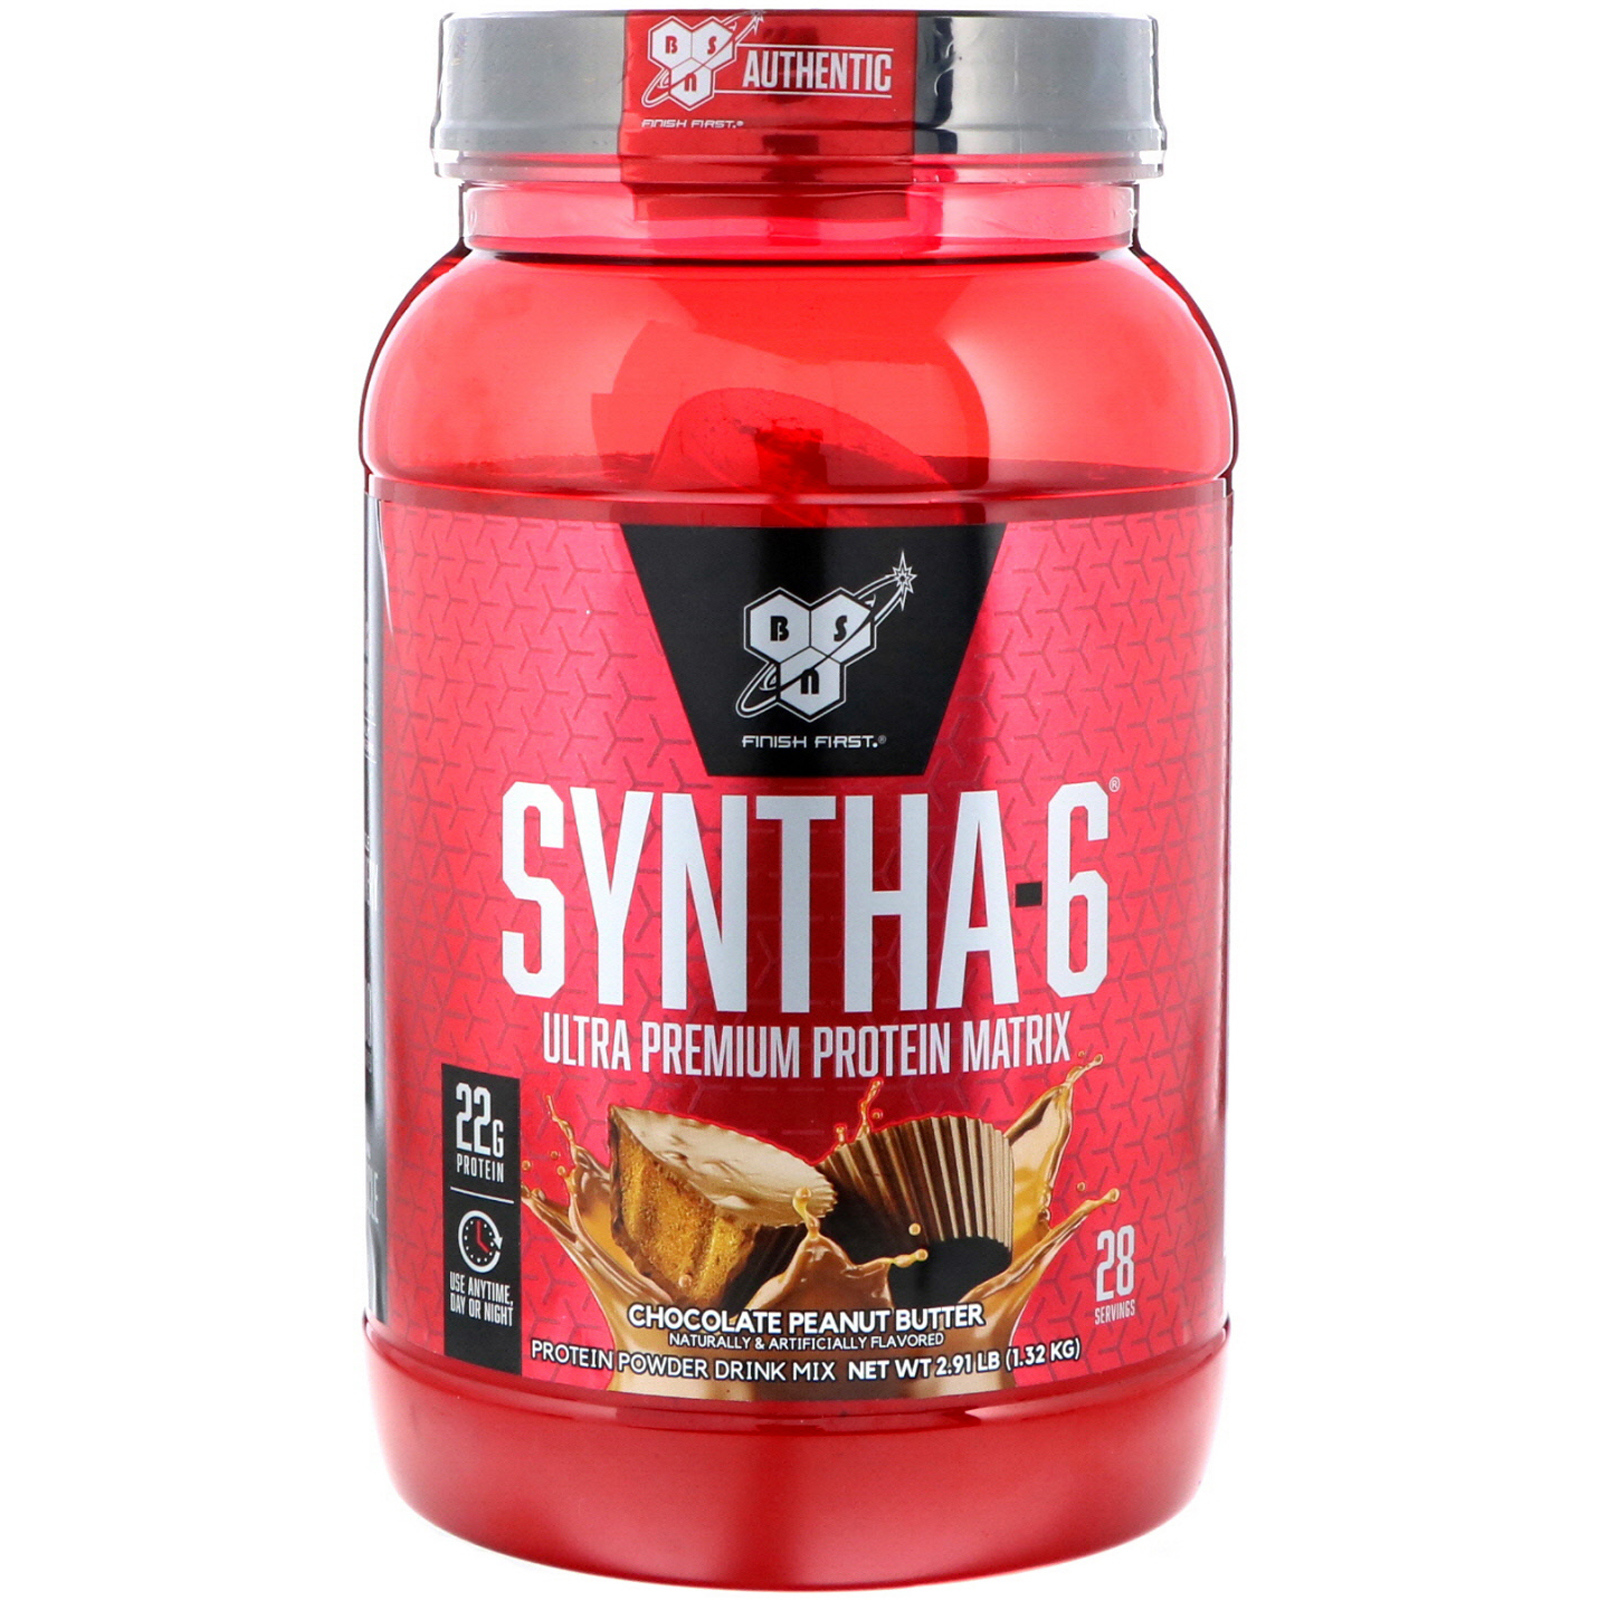 Bsn Syntha 6 Ultra Premium Protein Matrix Chocolate Peanut Butter 2 91 Lbs 1 32 Kg Iherb